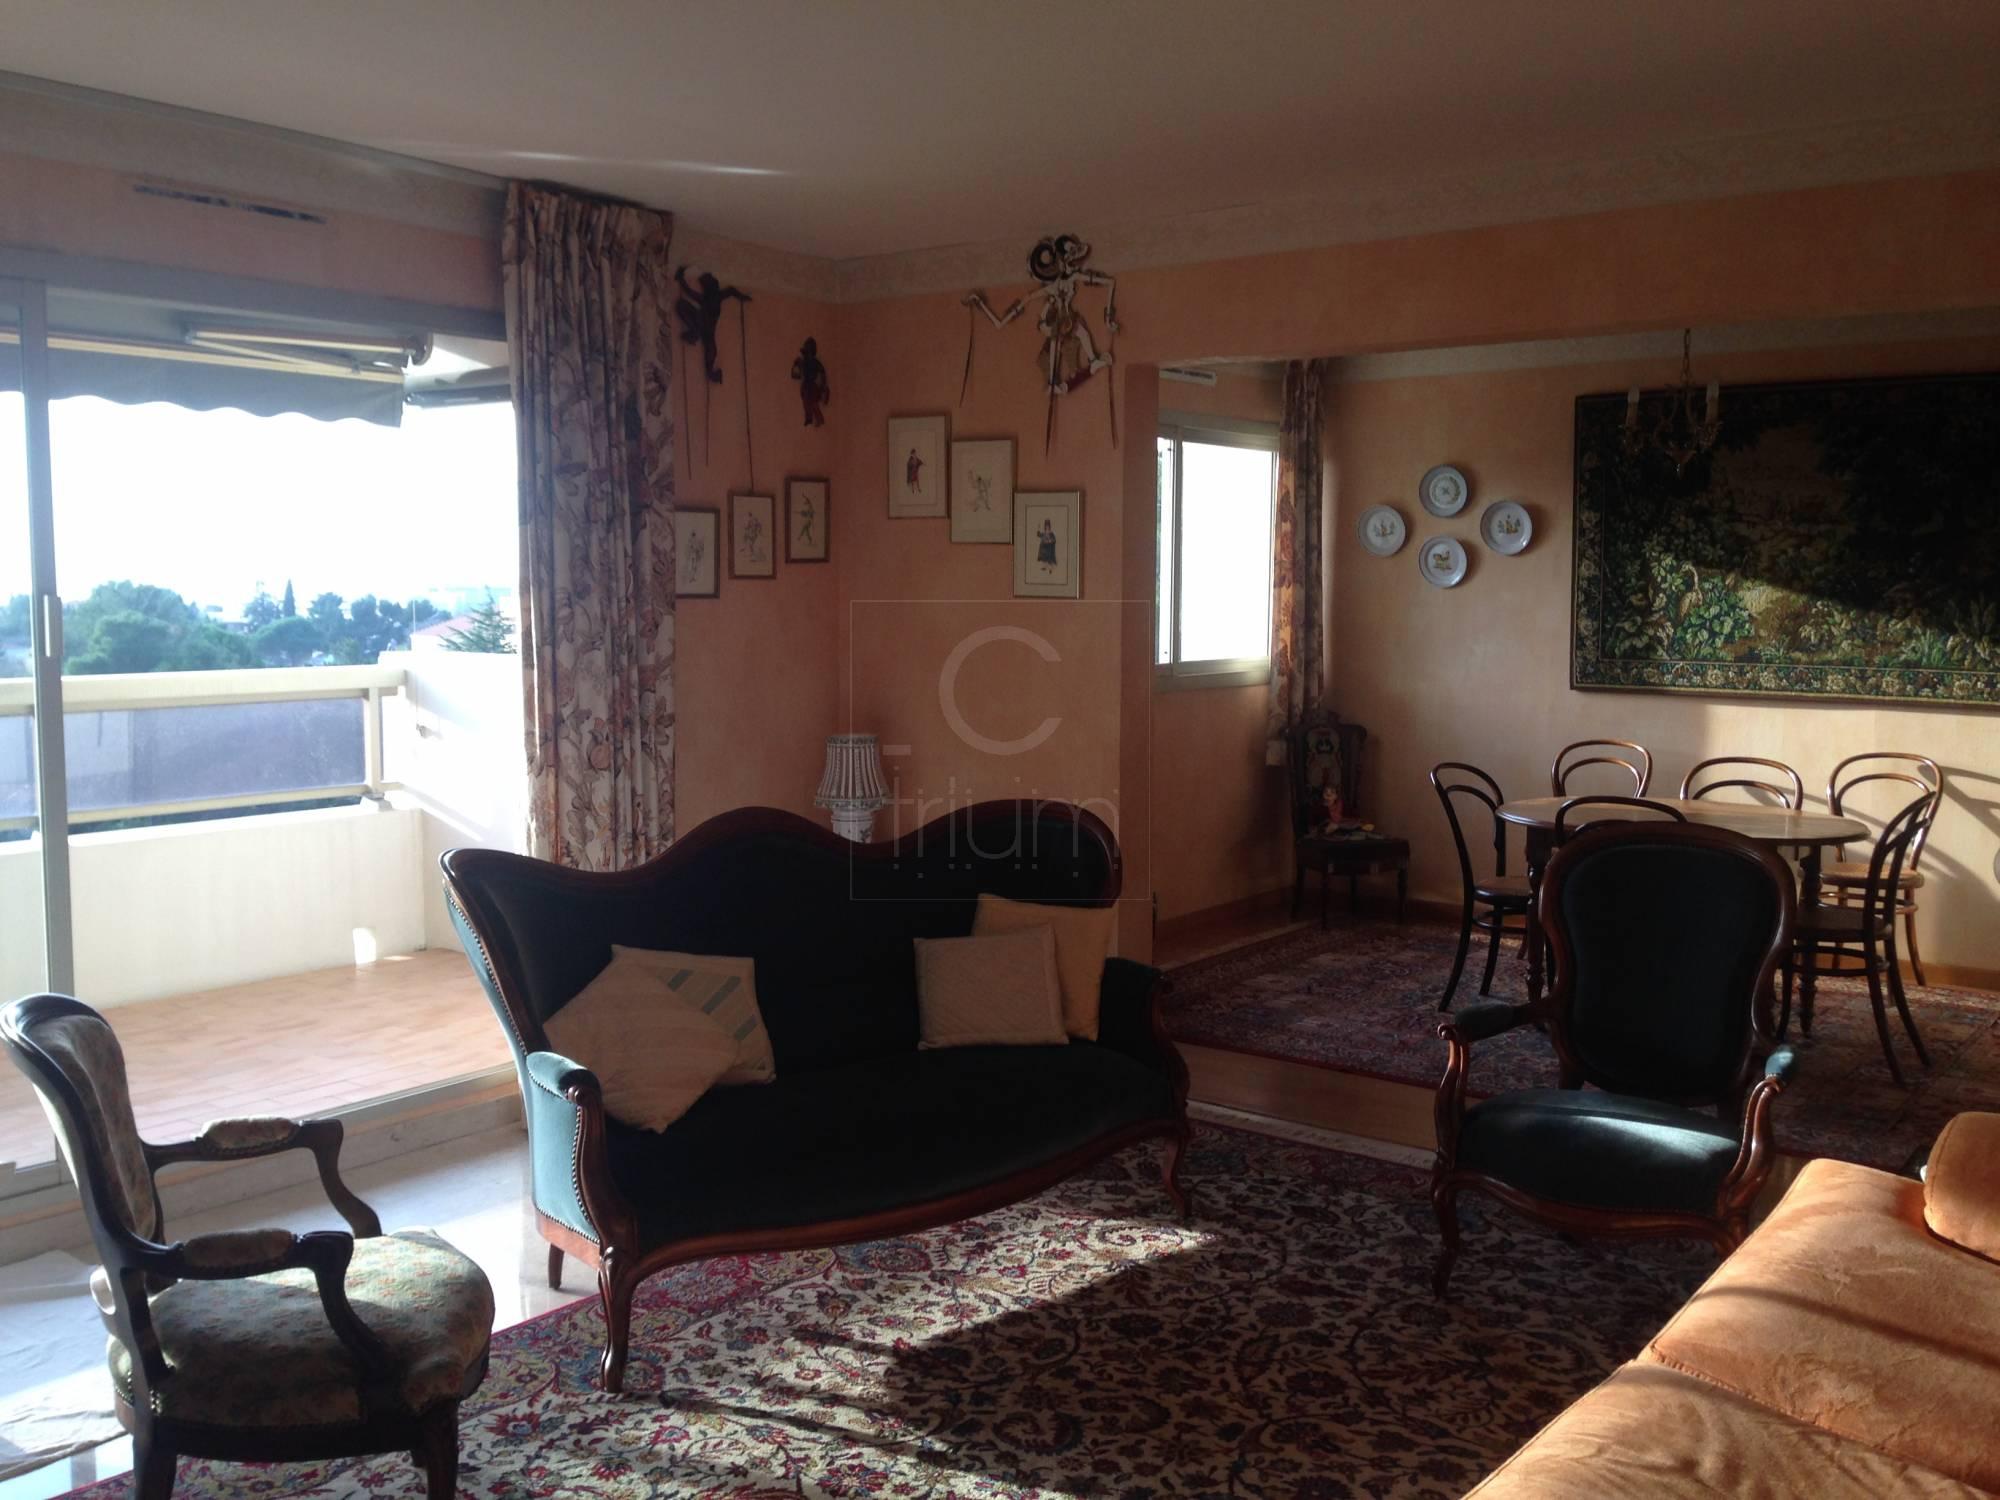 vente appartement t3 4 f3 4 marseille 9eme parc berger terrasse calme agence immobili re. Black Bedroom Furniture Sets. Home Design Ideas